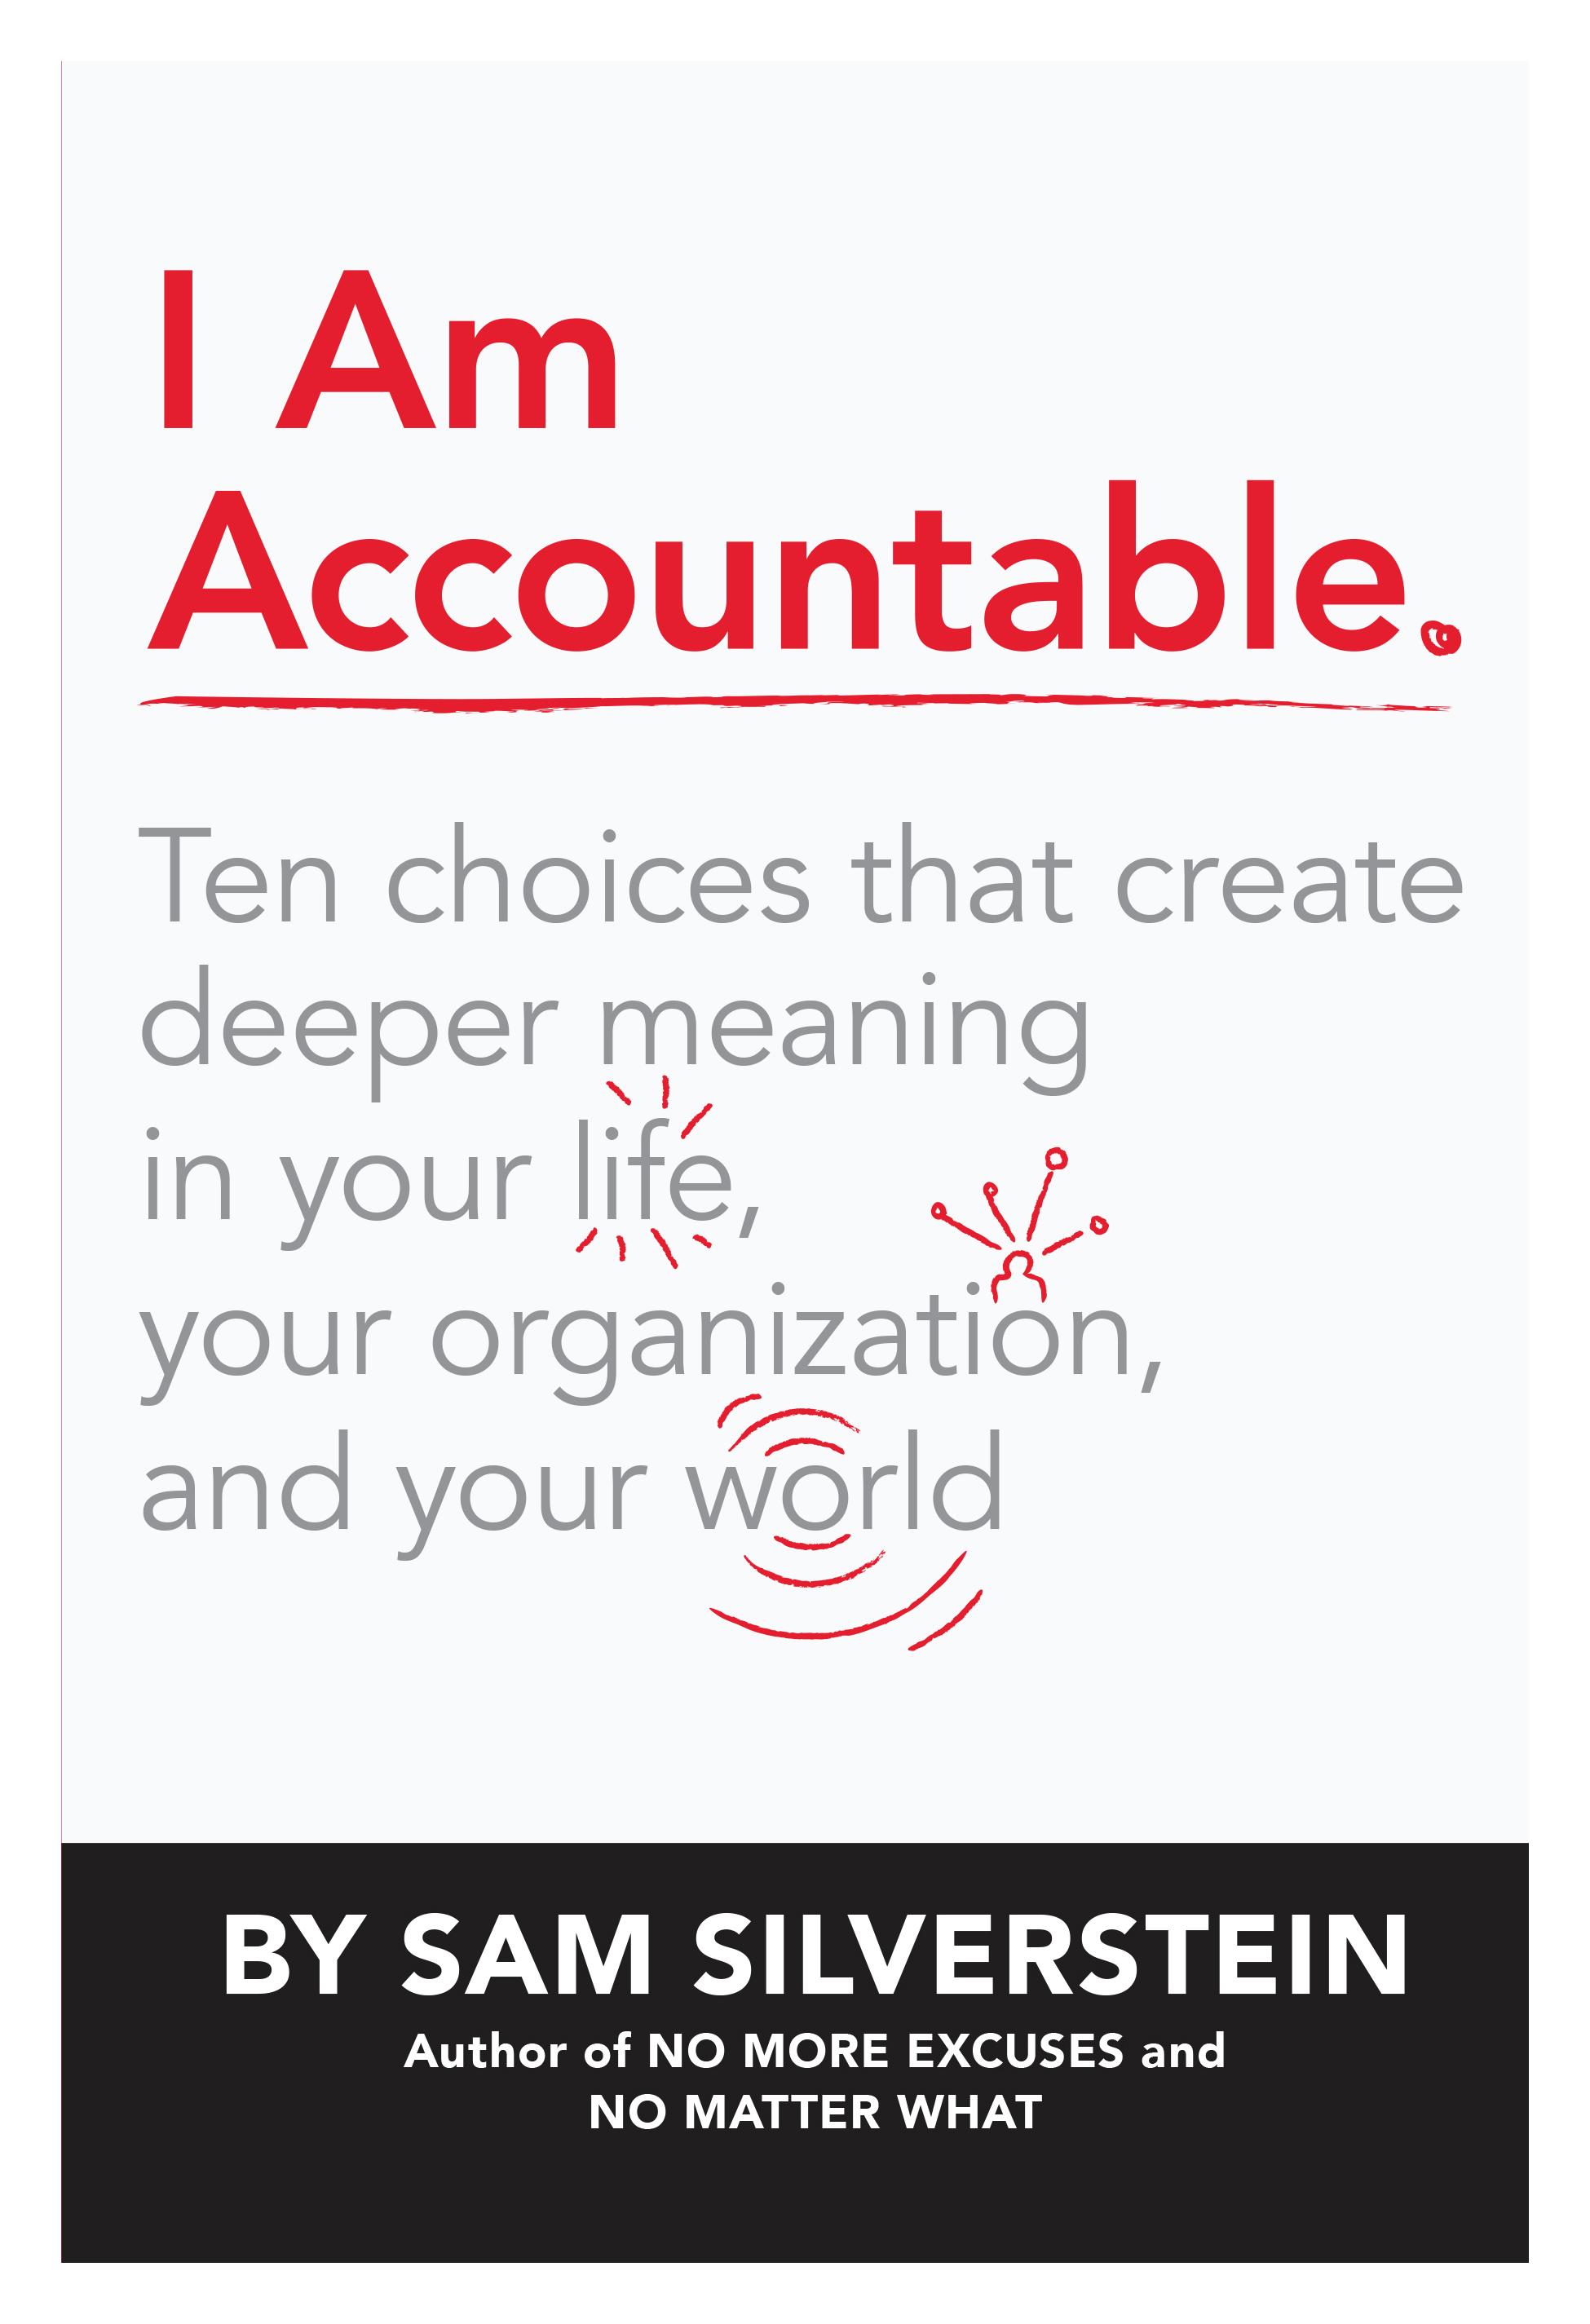 I_Am_Accountable.jpg